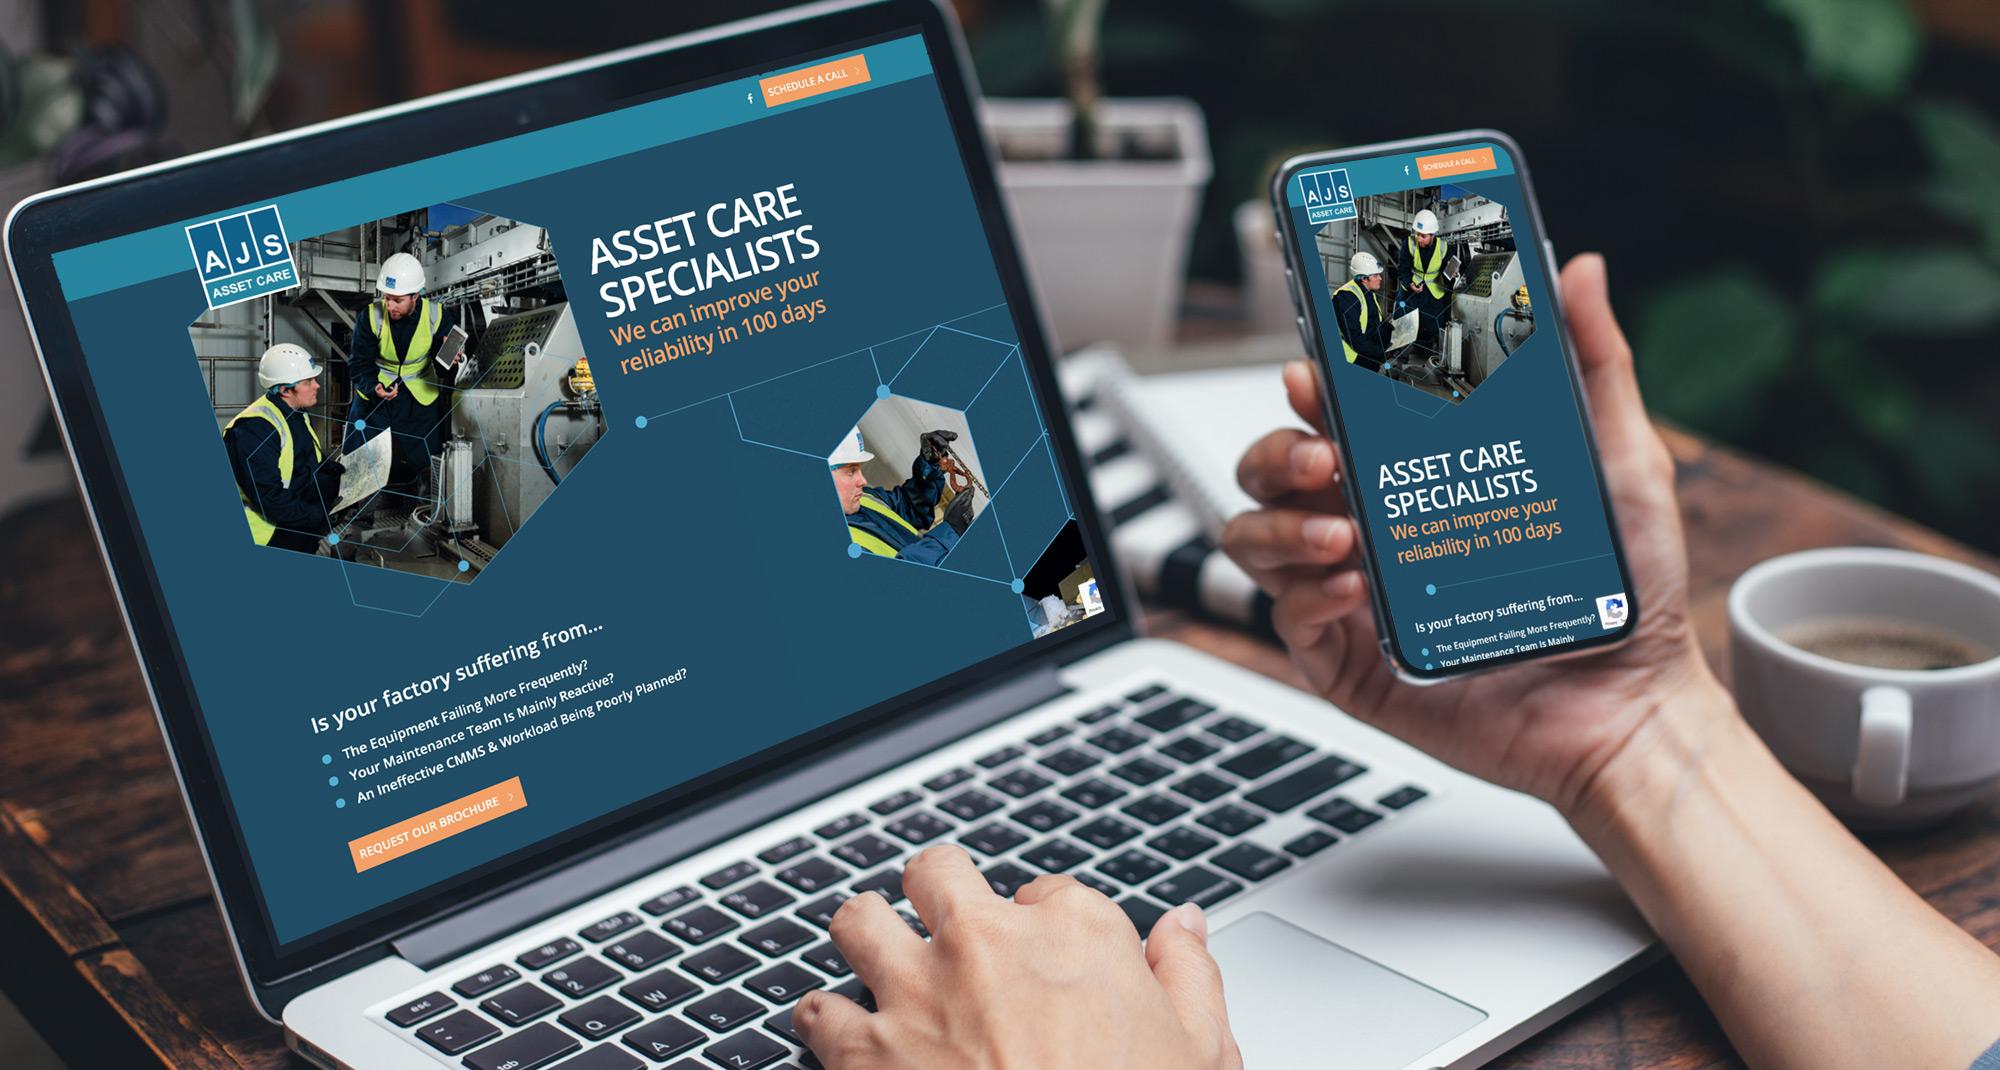 AJS-assetcare website